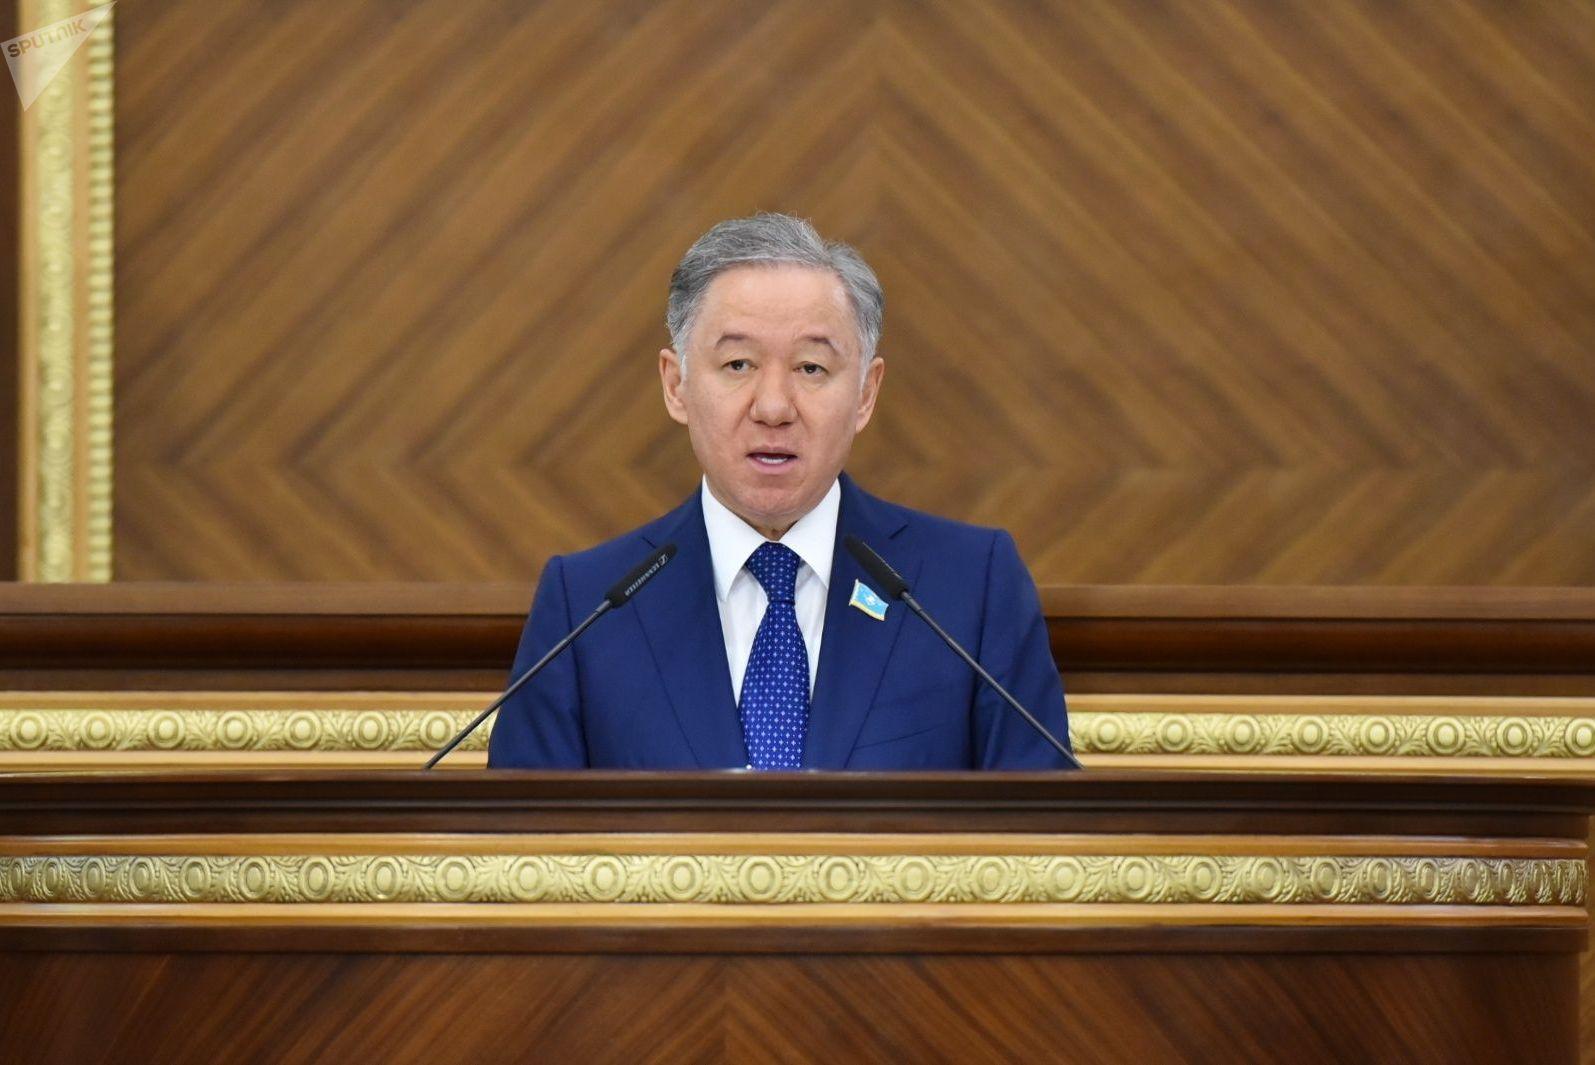 Председатель мажилиса парламента Республики Казахстан Нурлан Нигматулин